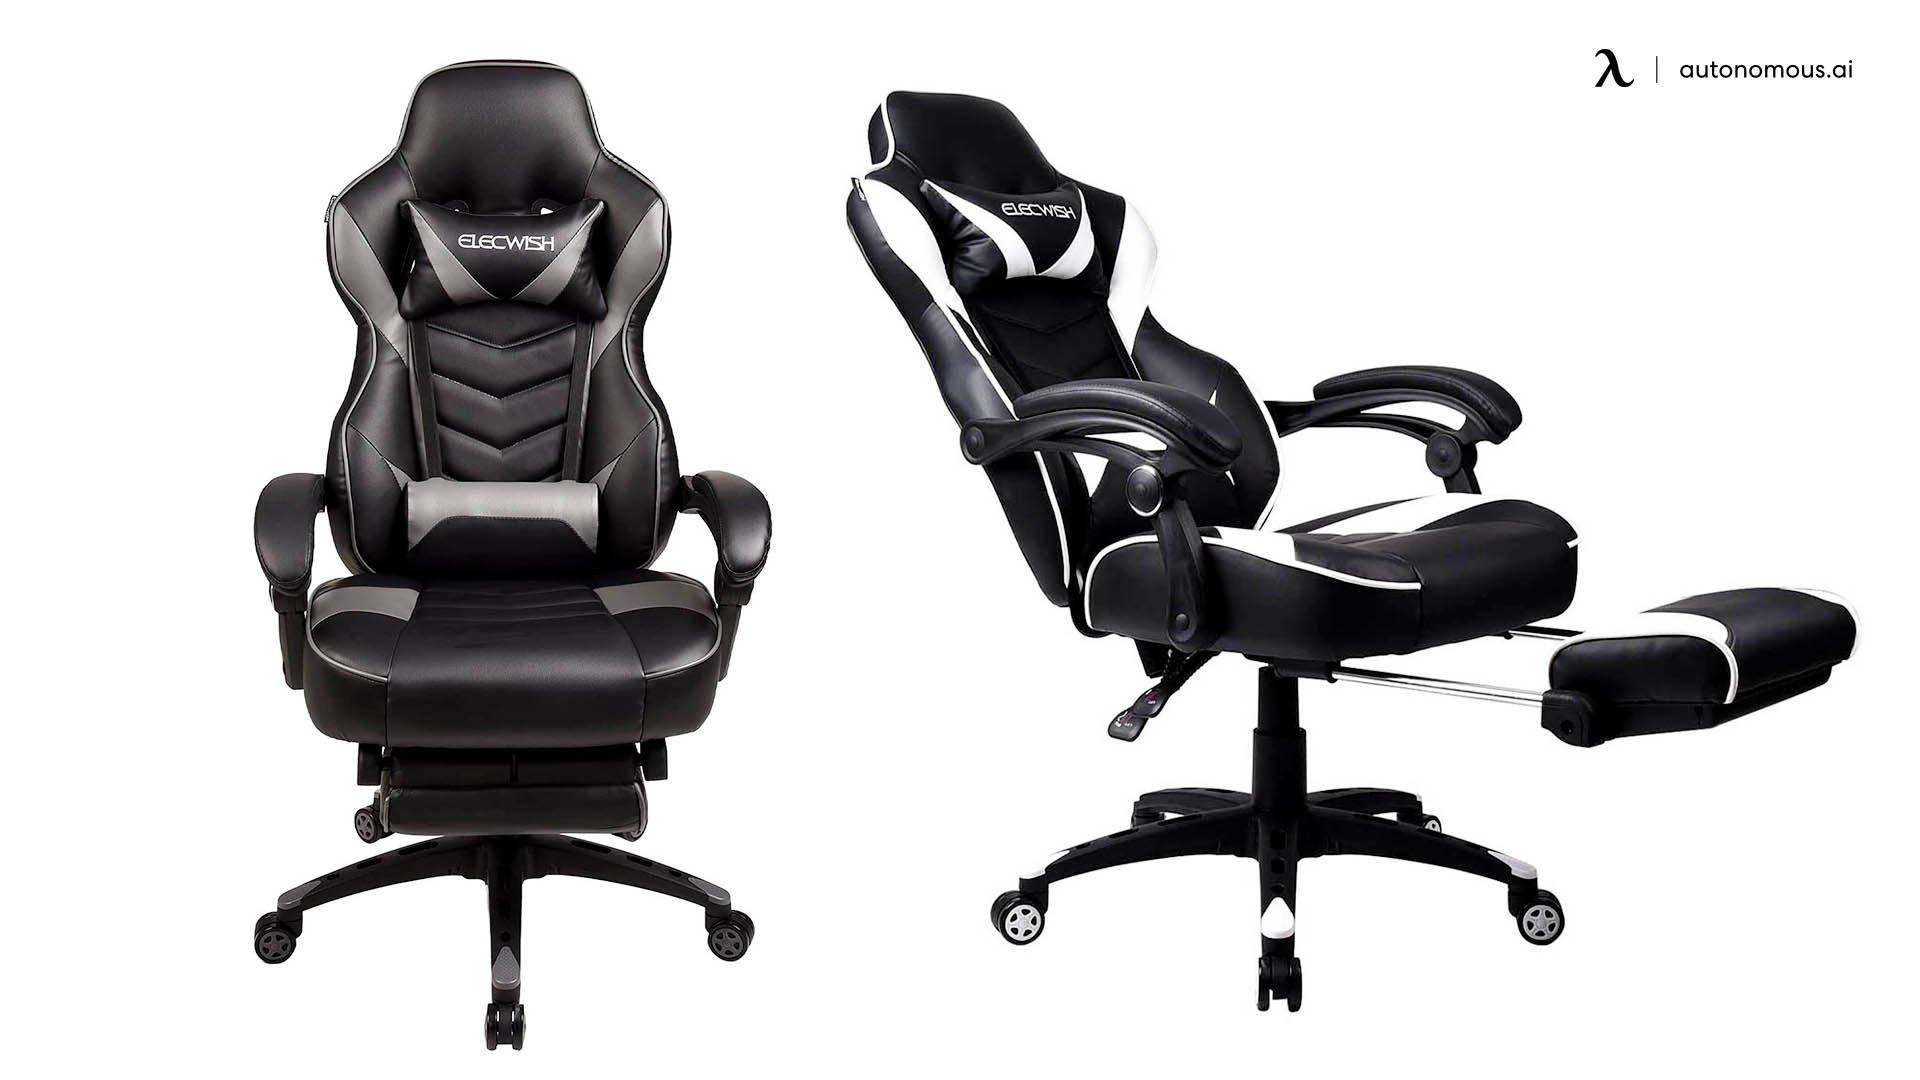 PULUOMIS Reclining Ergonomic Office Chair